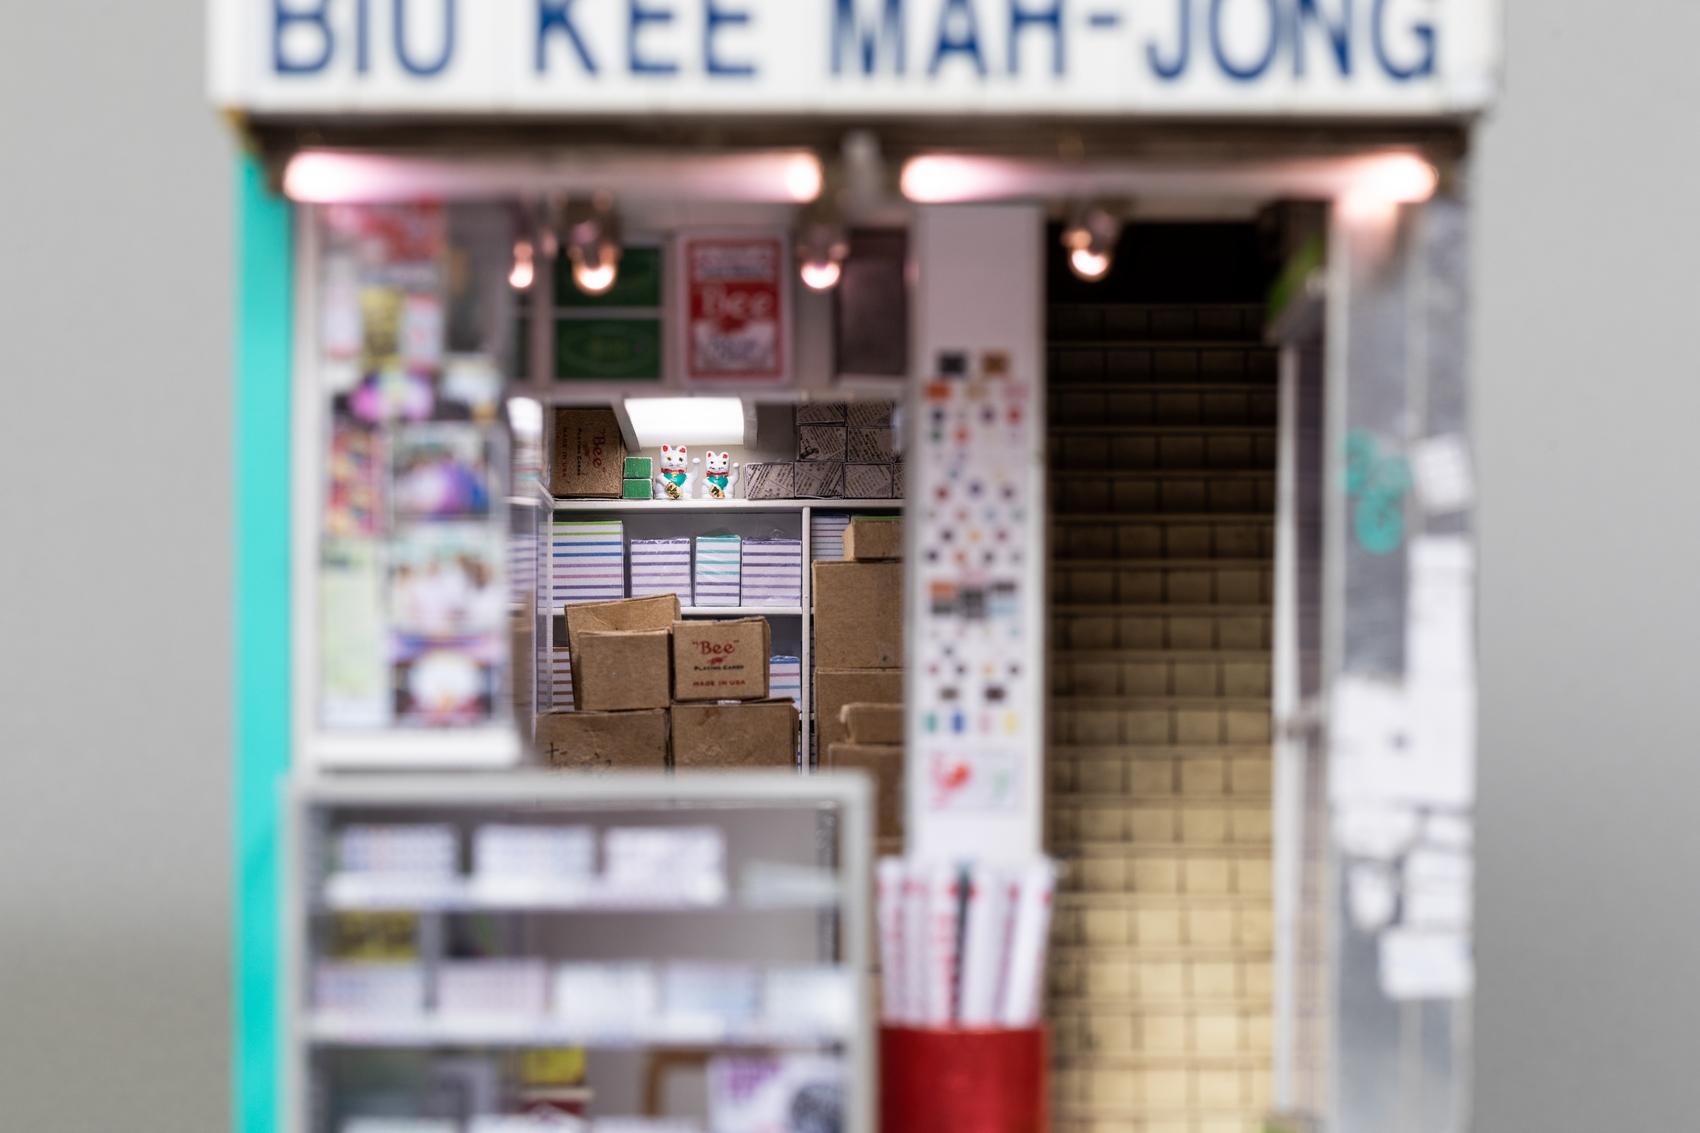 Biu Kee Mahjong